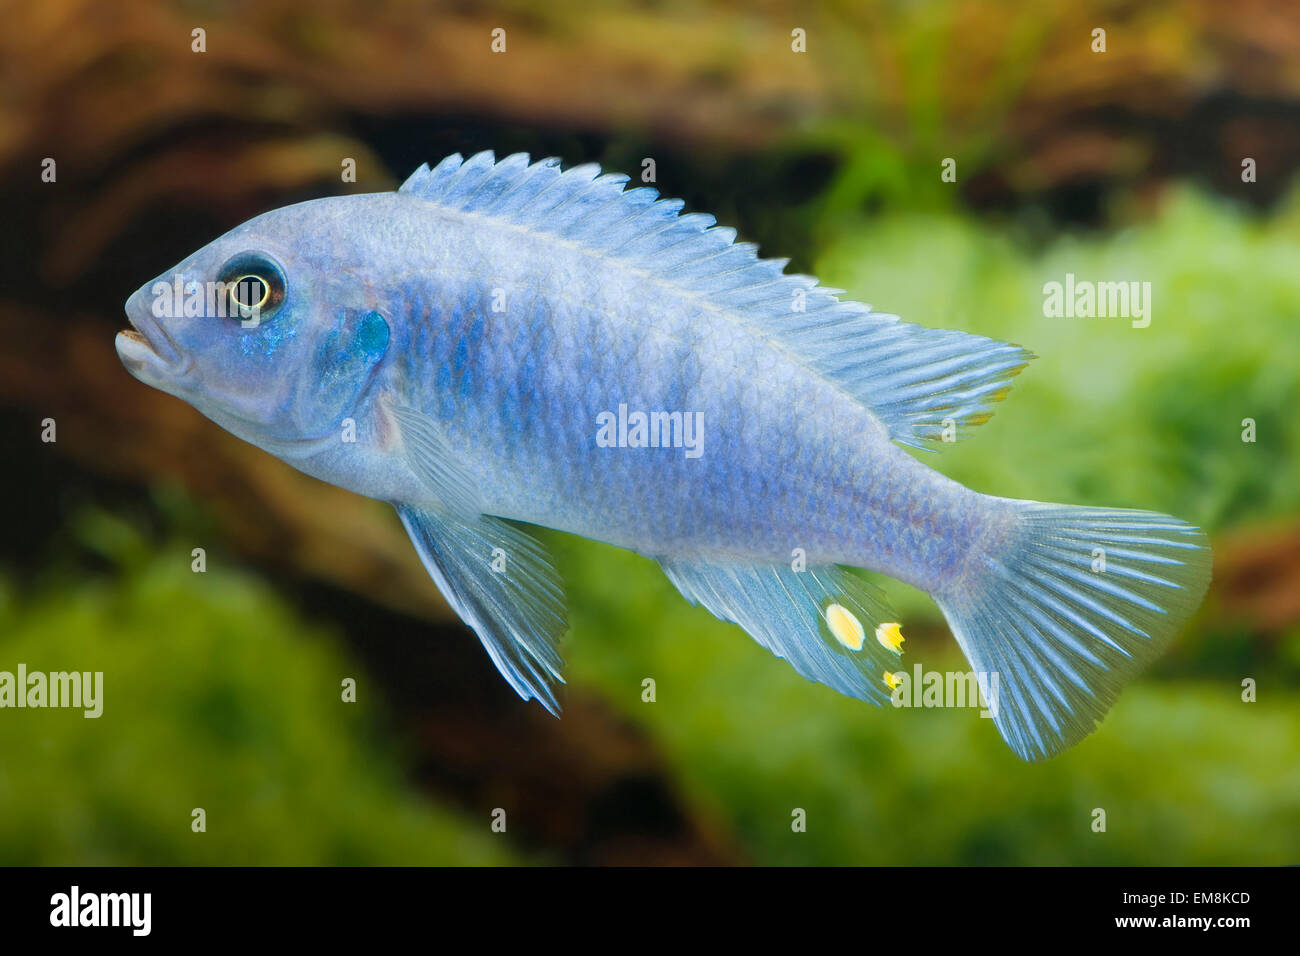 Pseudotropheus spec ice blue malawi buntbarsch malawi for Malawi buntbarsch